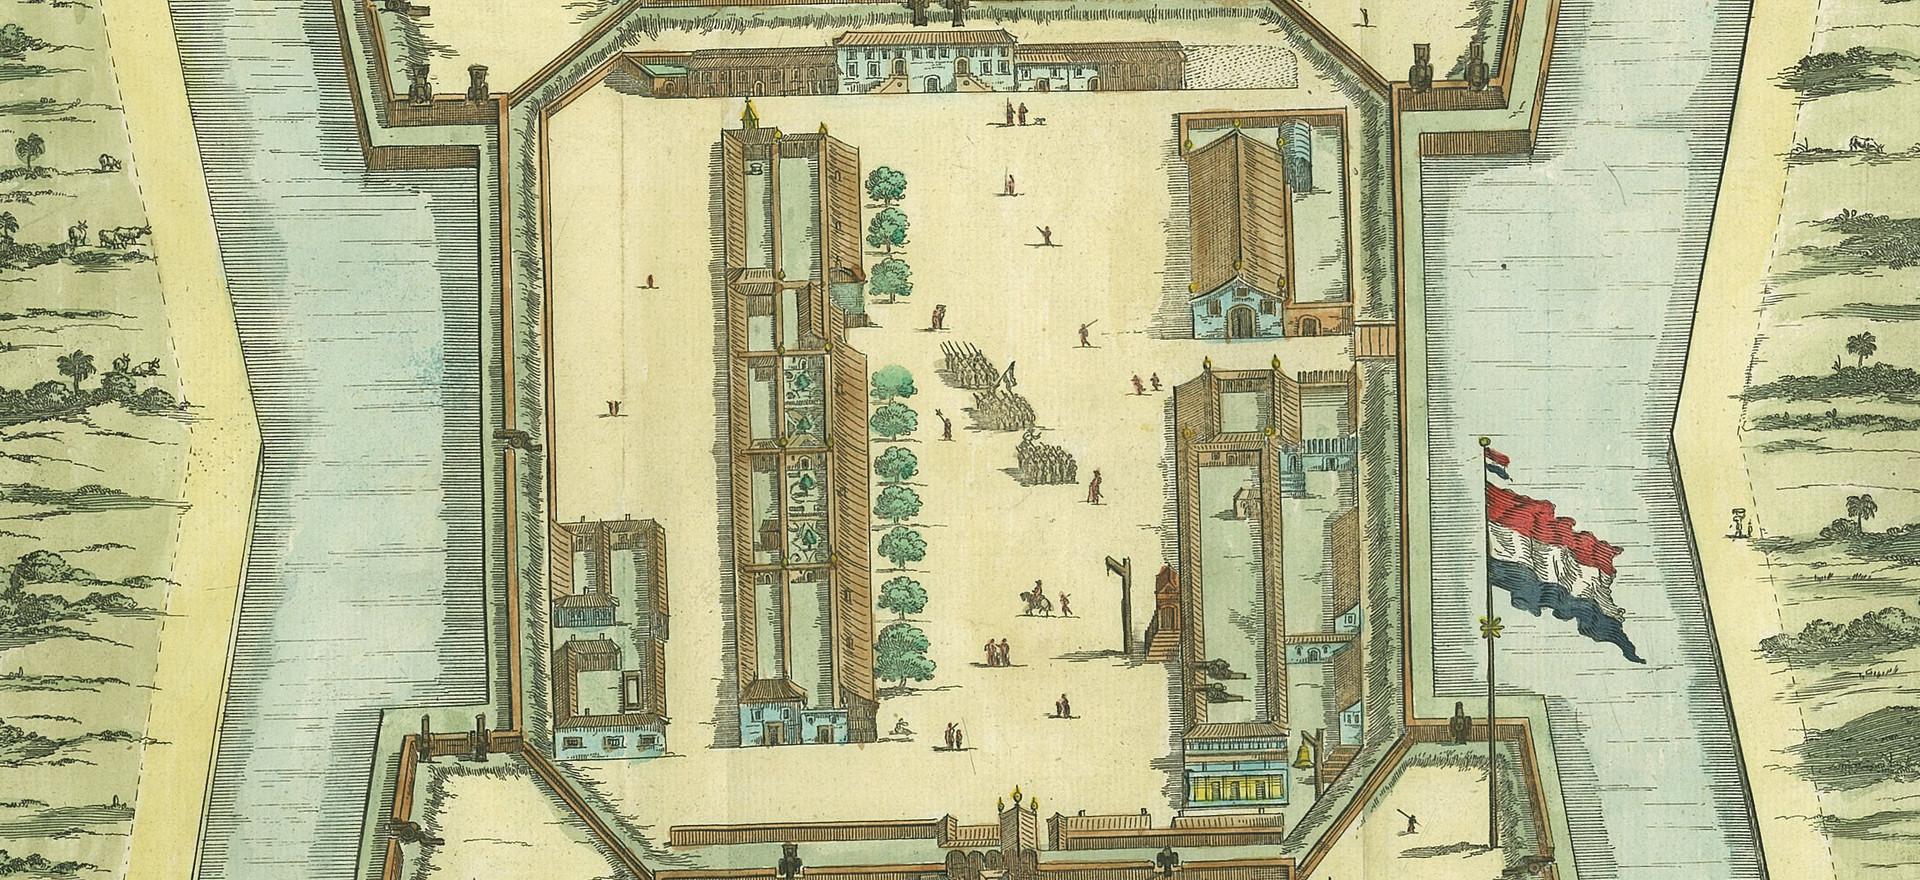 Pulicat_Fort_1744.jpg